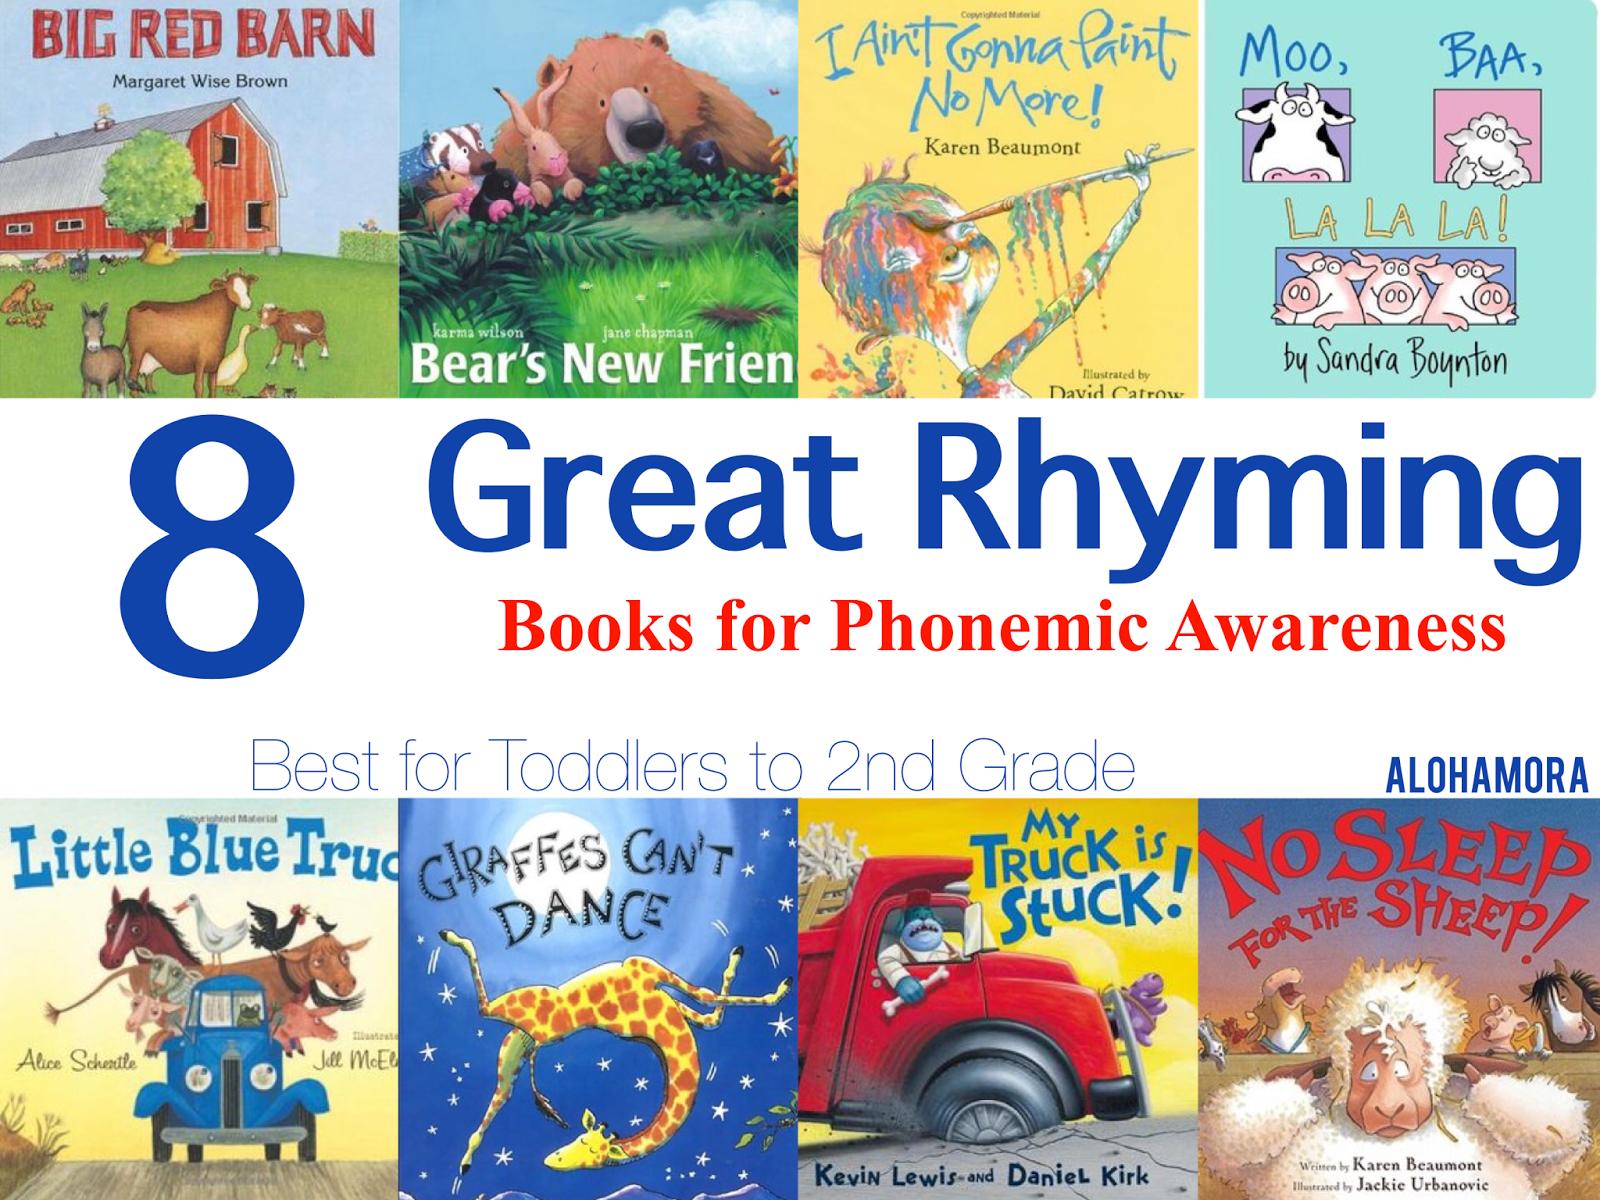 Alohamora Open A Book 8 Great Rhyming Books For Phonemic Awareness